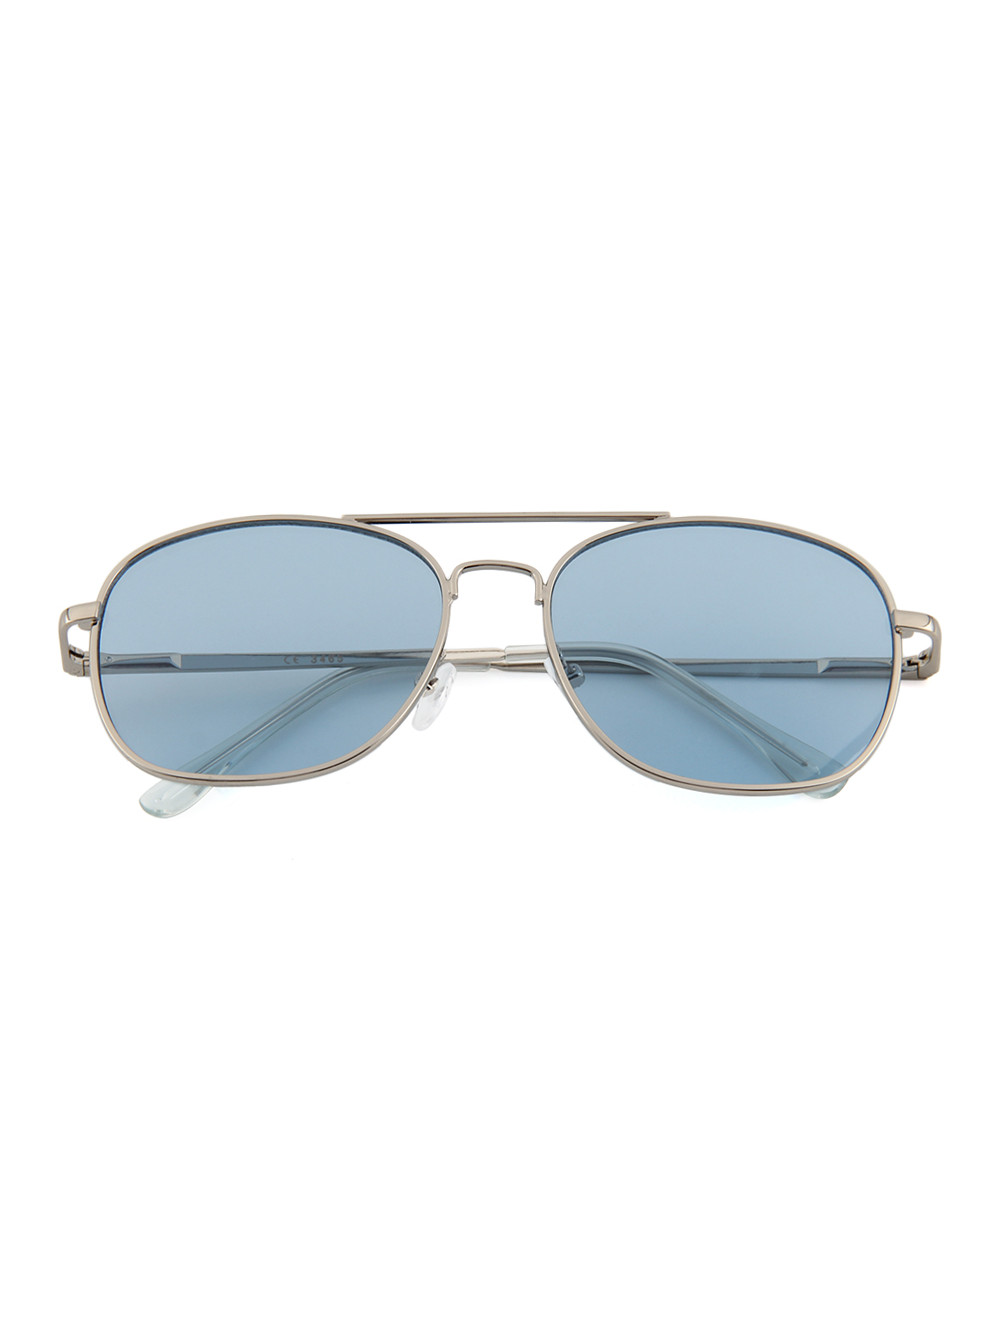 Slnečné okuliare Aviator Square Blue 4f3c84fc2fa